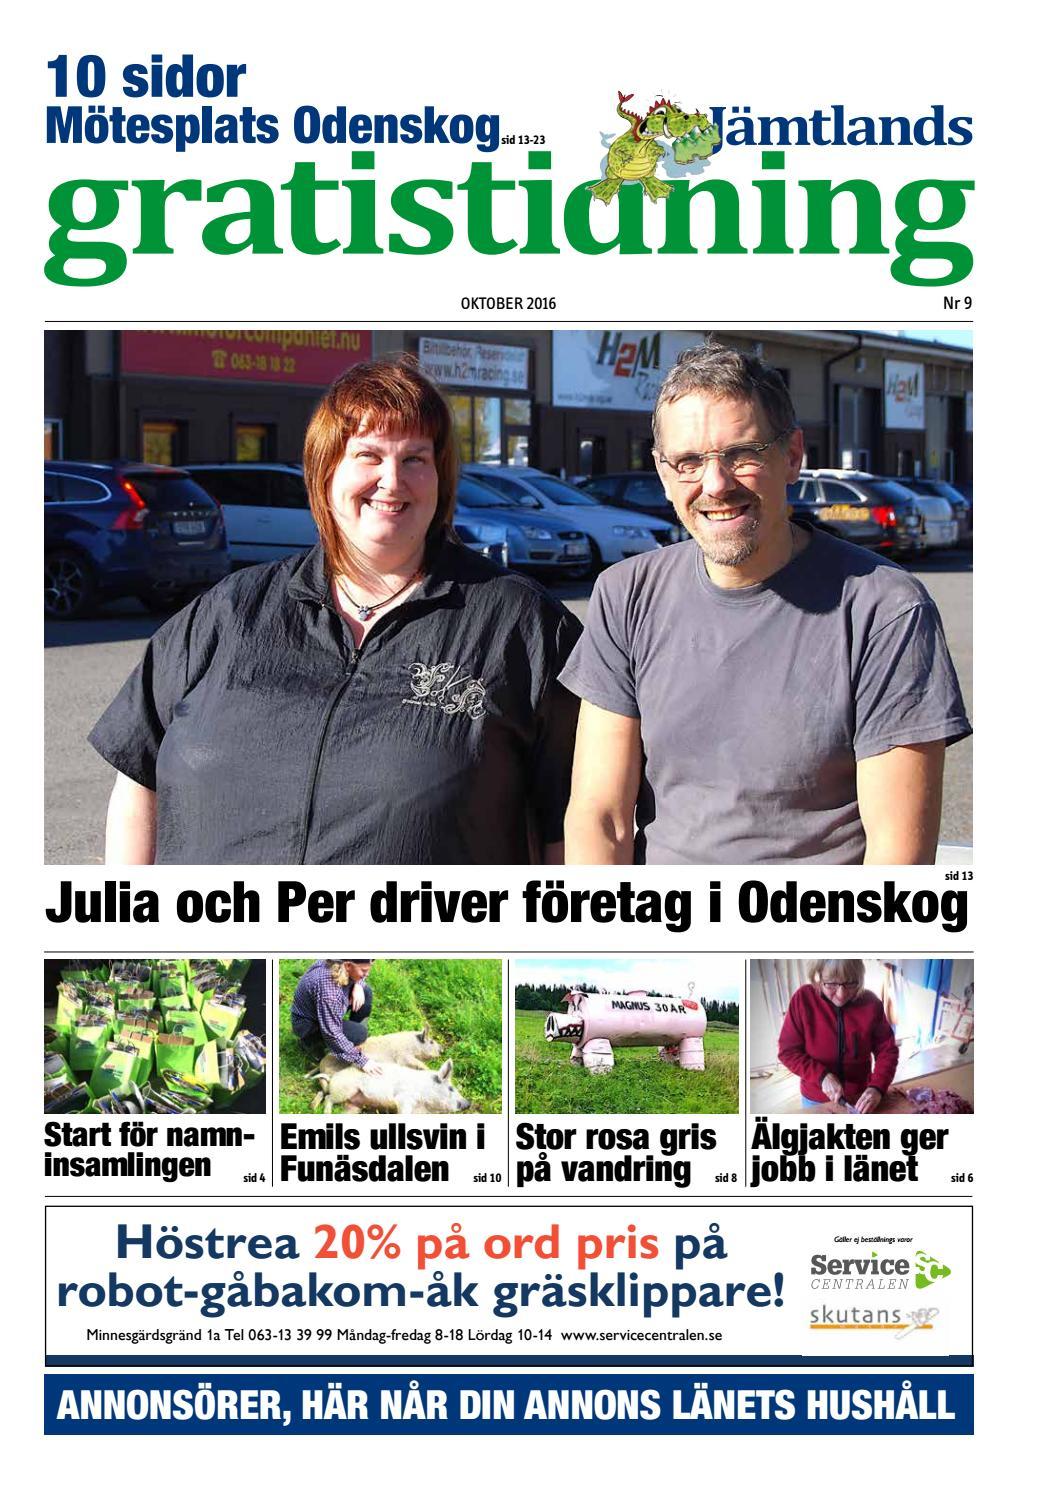 ldreboende Jmtland | Fretag | patient-survey.net | sida 3